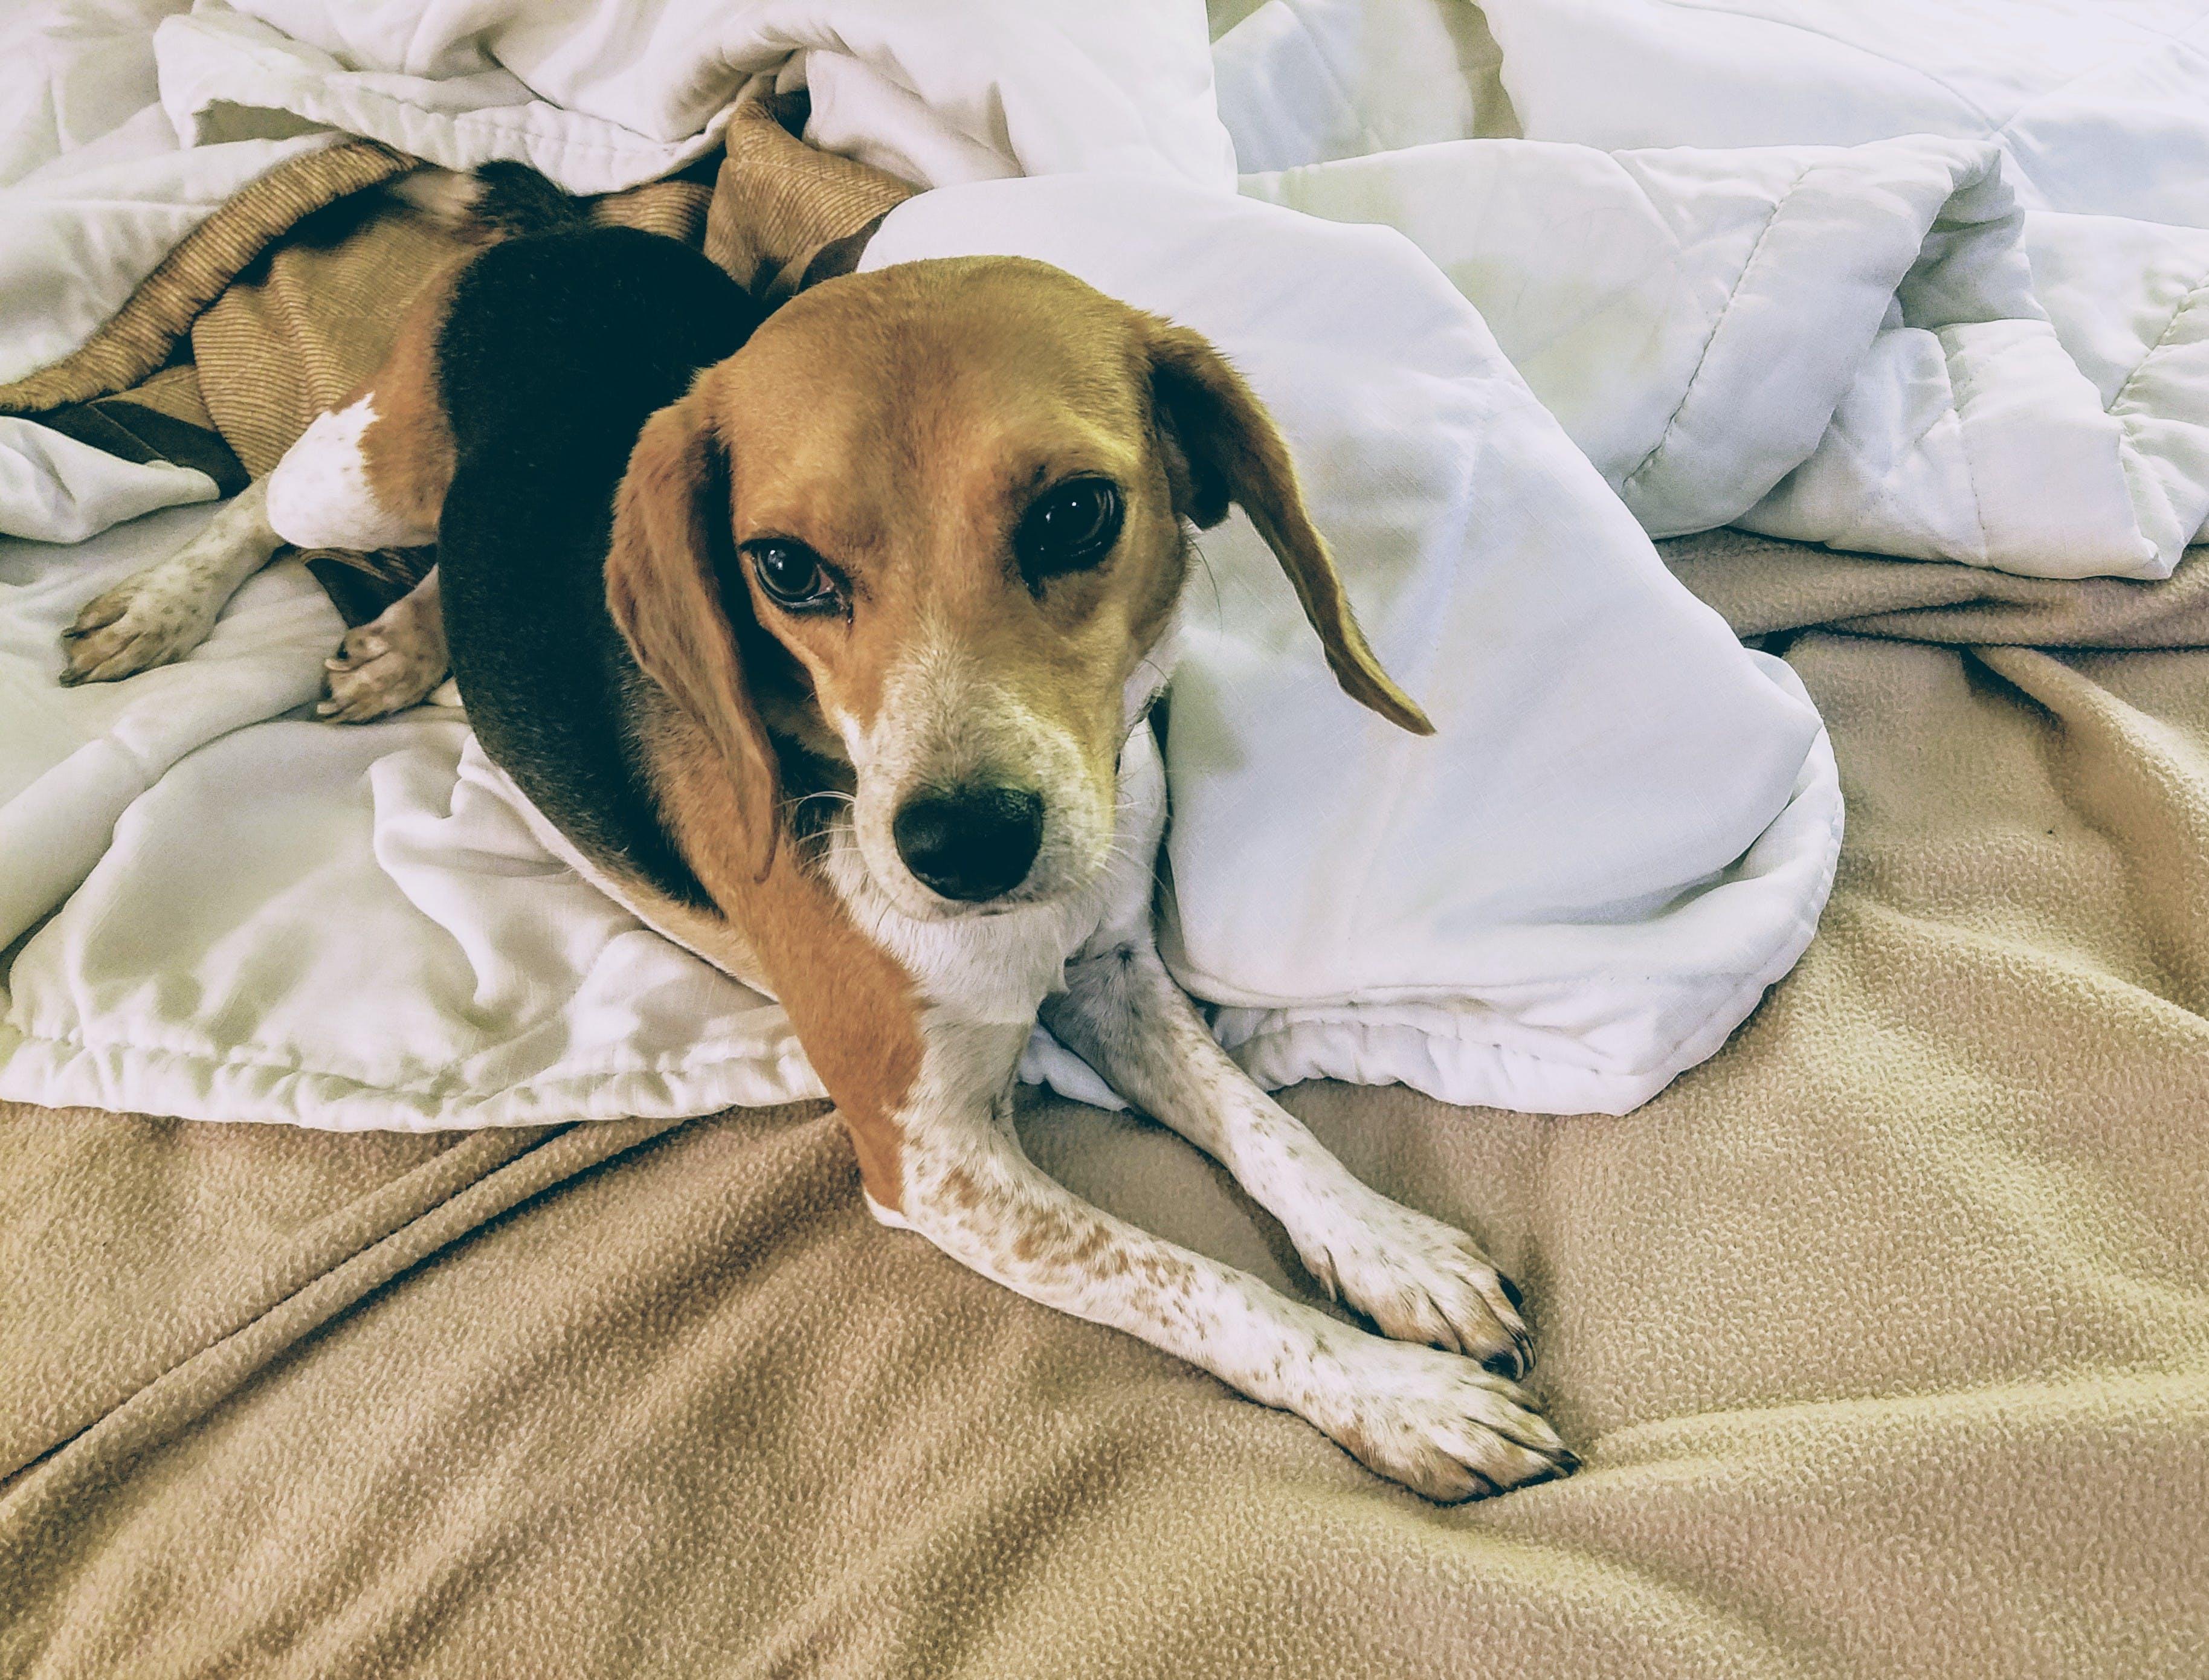 Free stock photo of dog, pets, beagle, cute animals